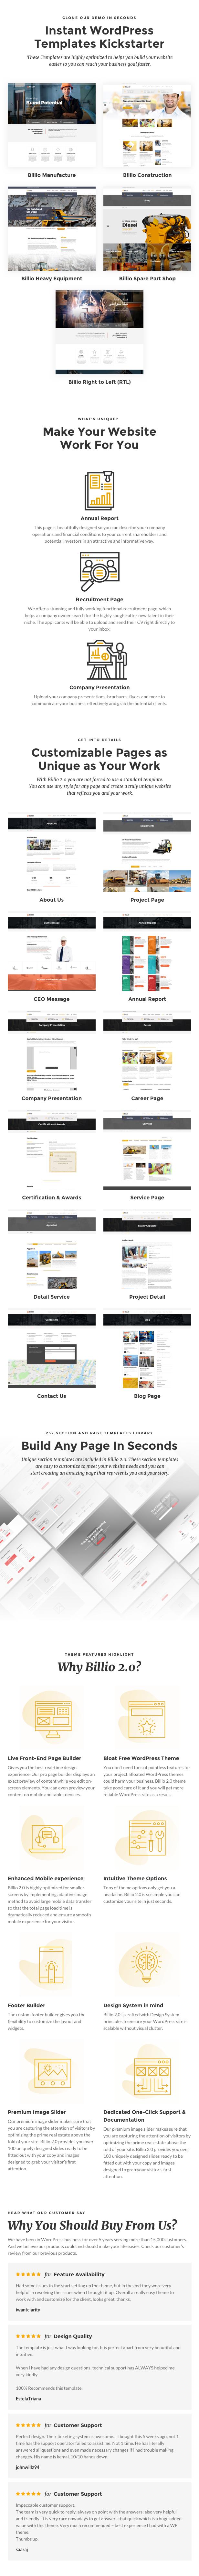 Billio 2.0 - Engineering & Industrial WordPress Theme - 1